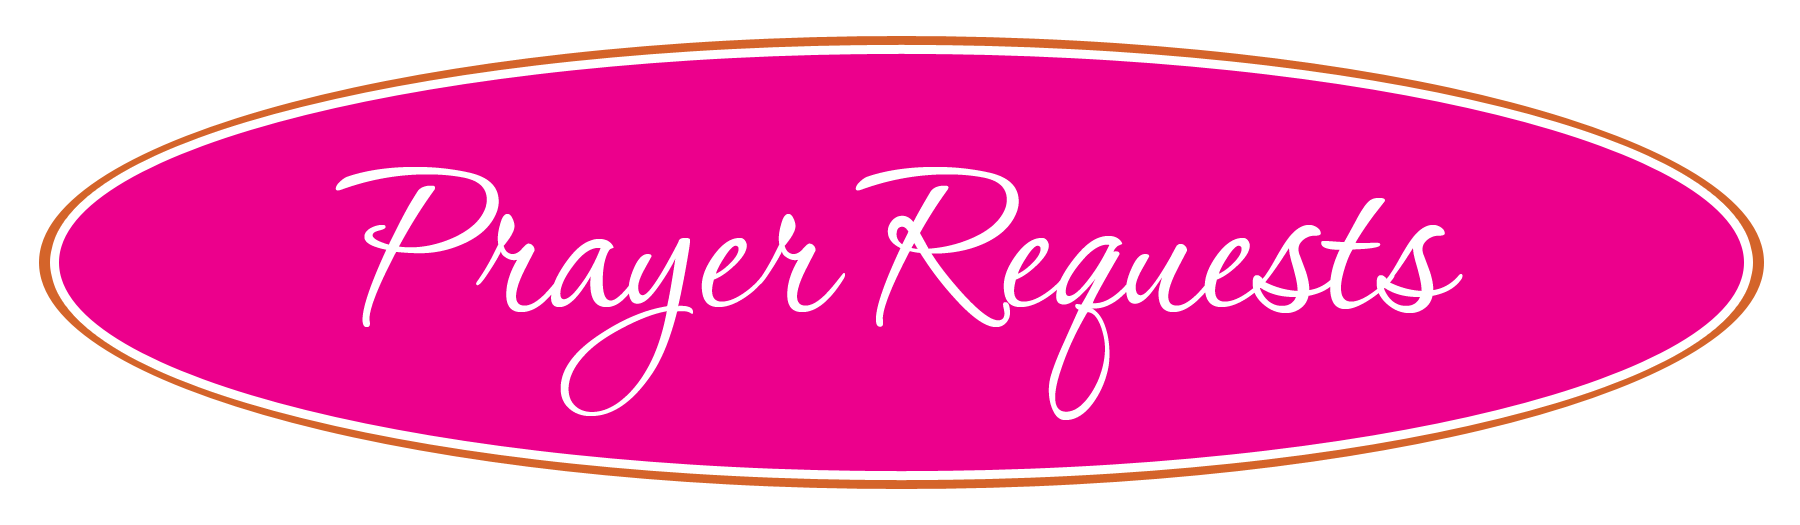 need prayer request clip art  u2013 cliparts